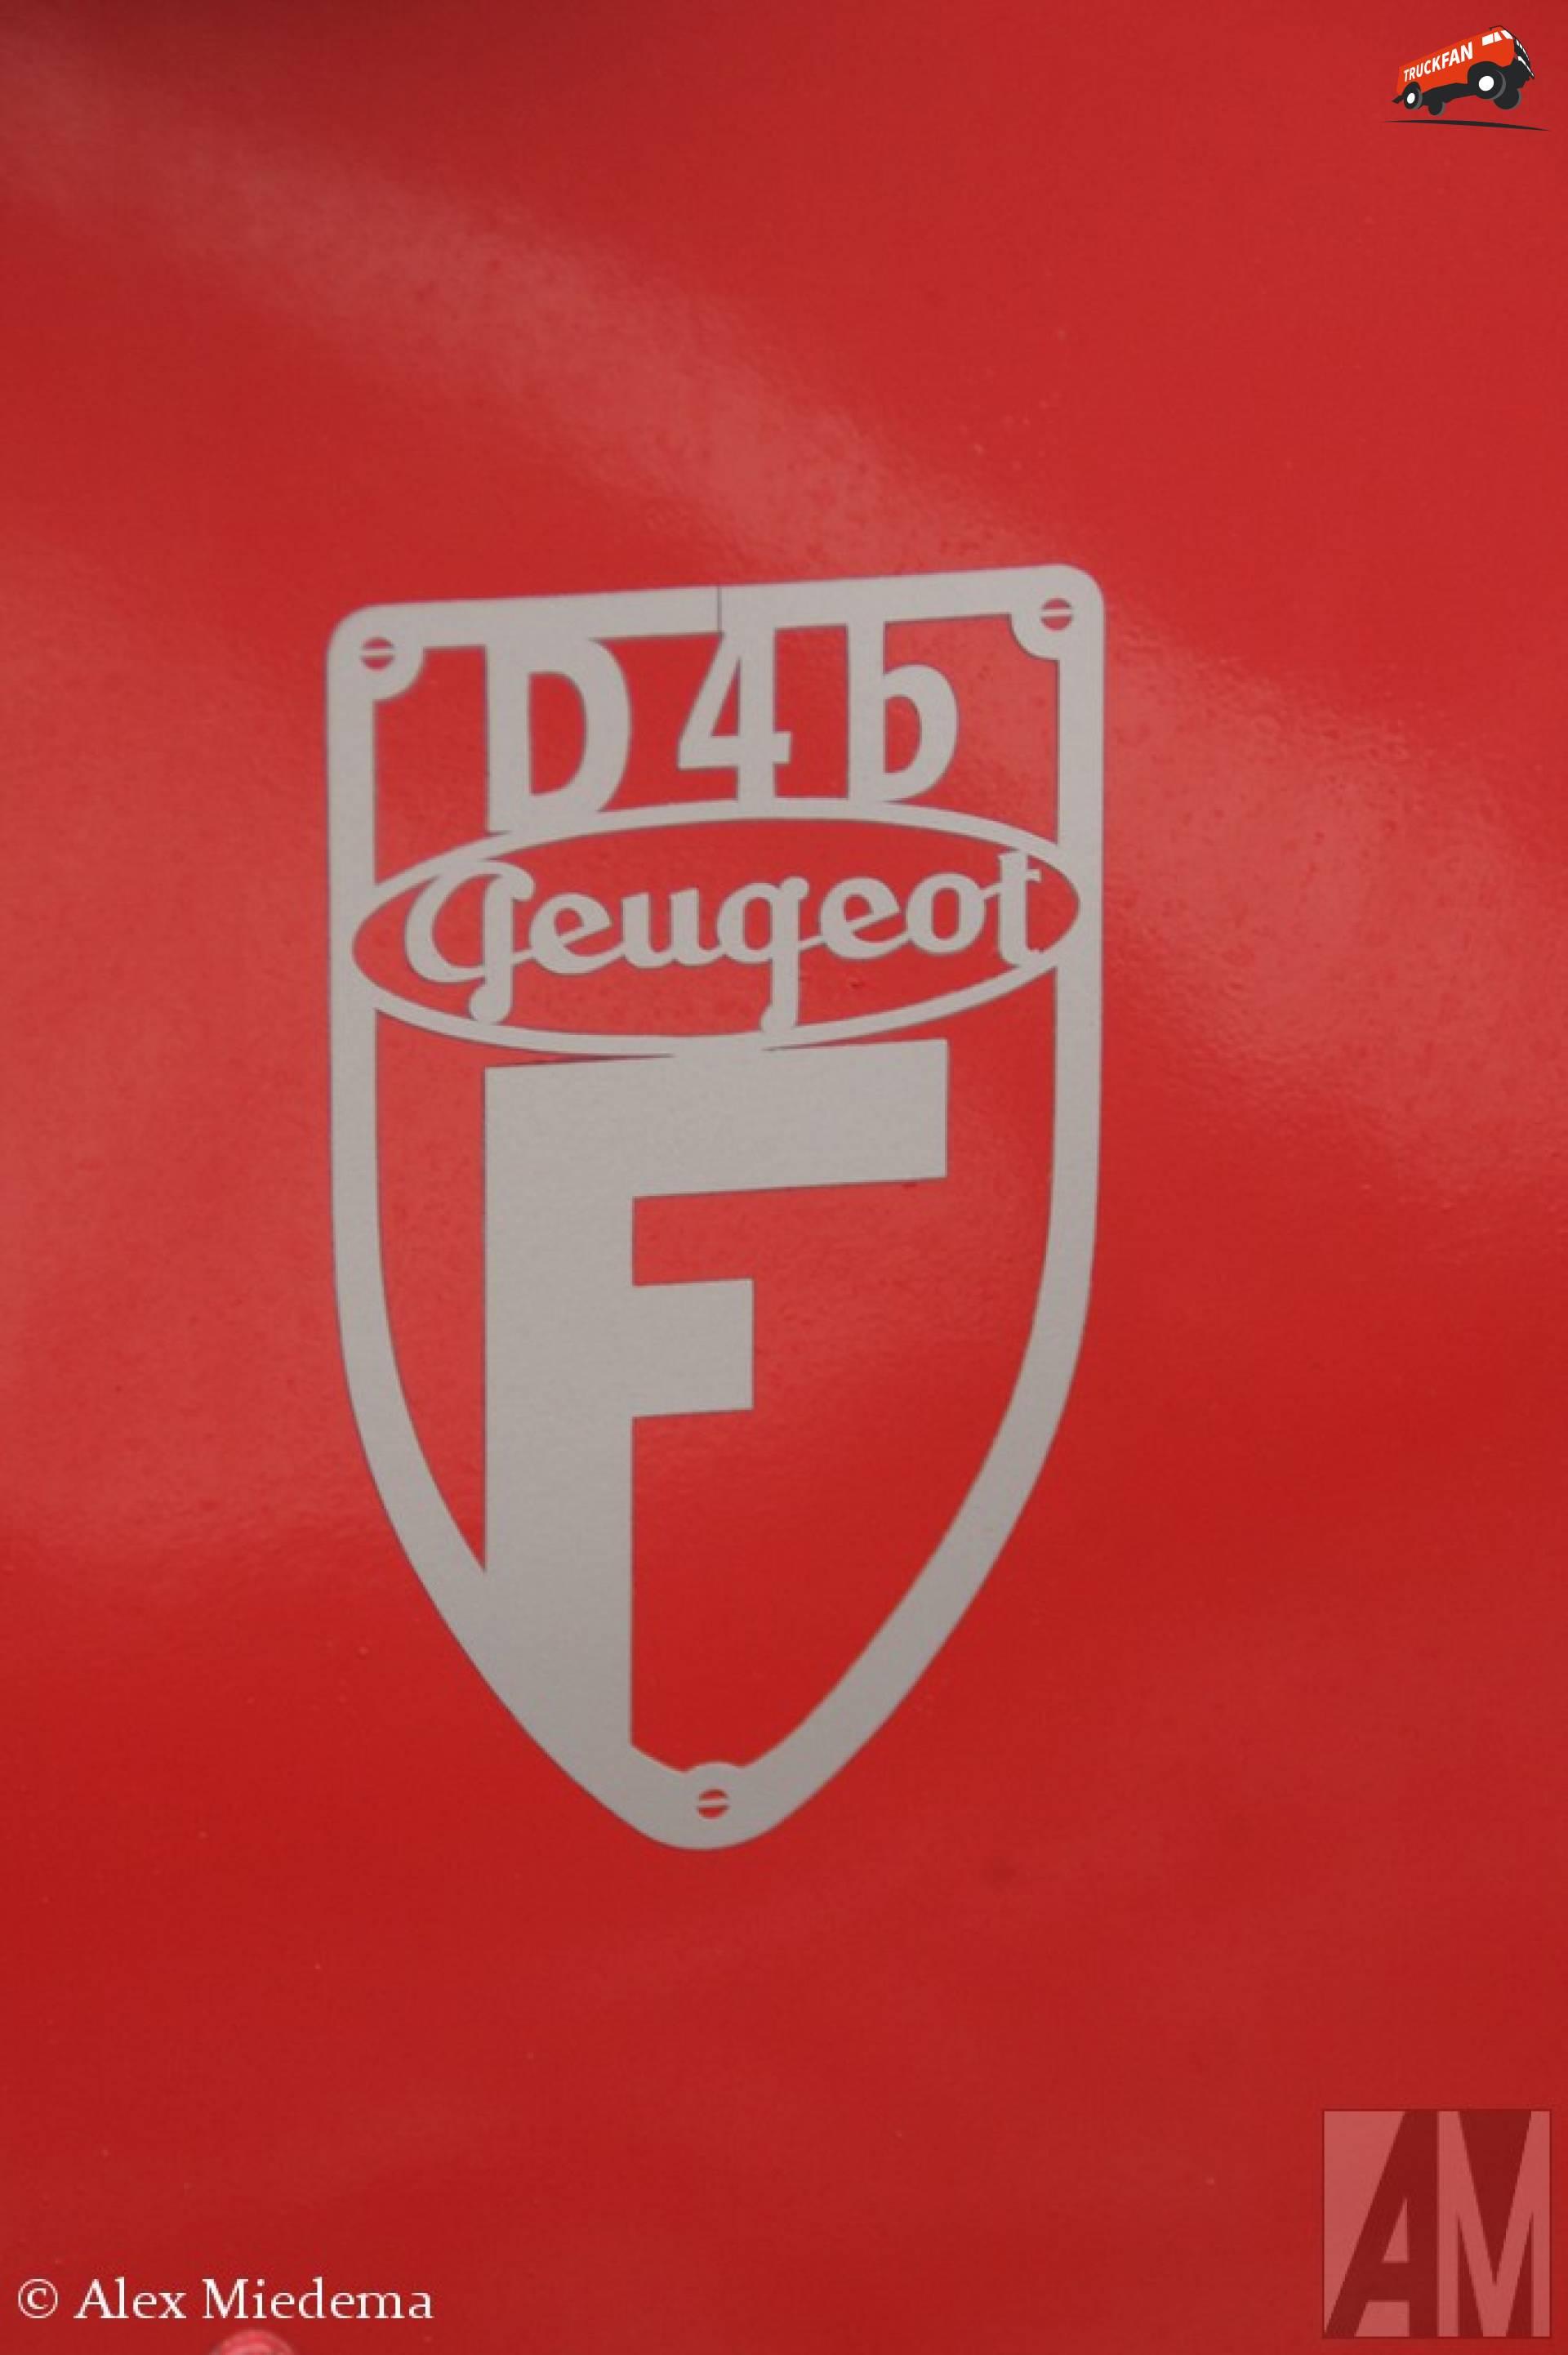 Peugeot D4